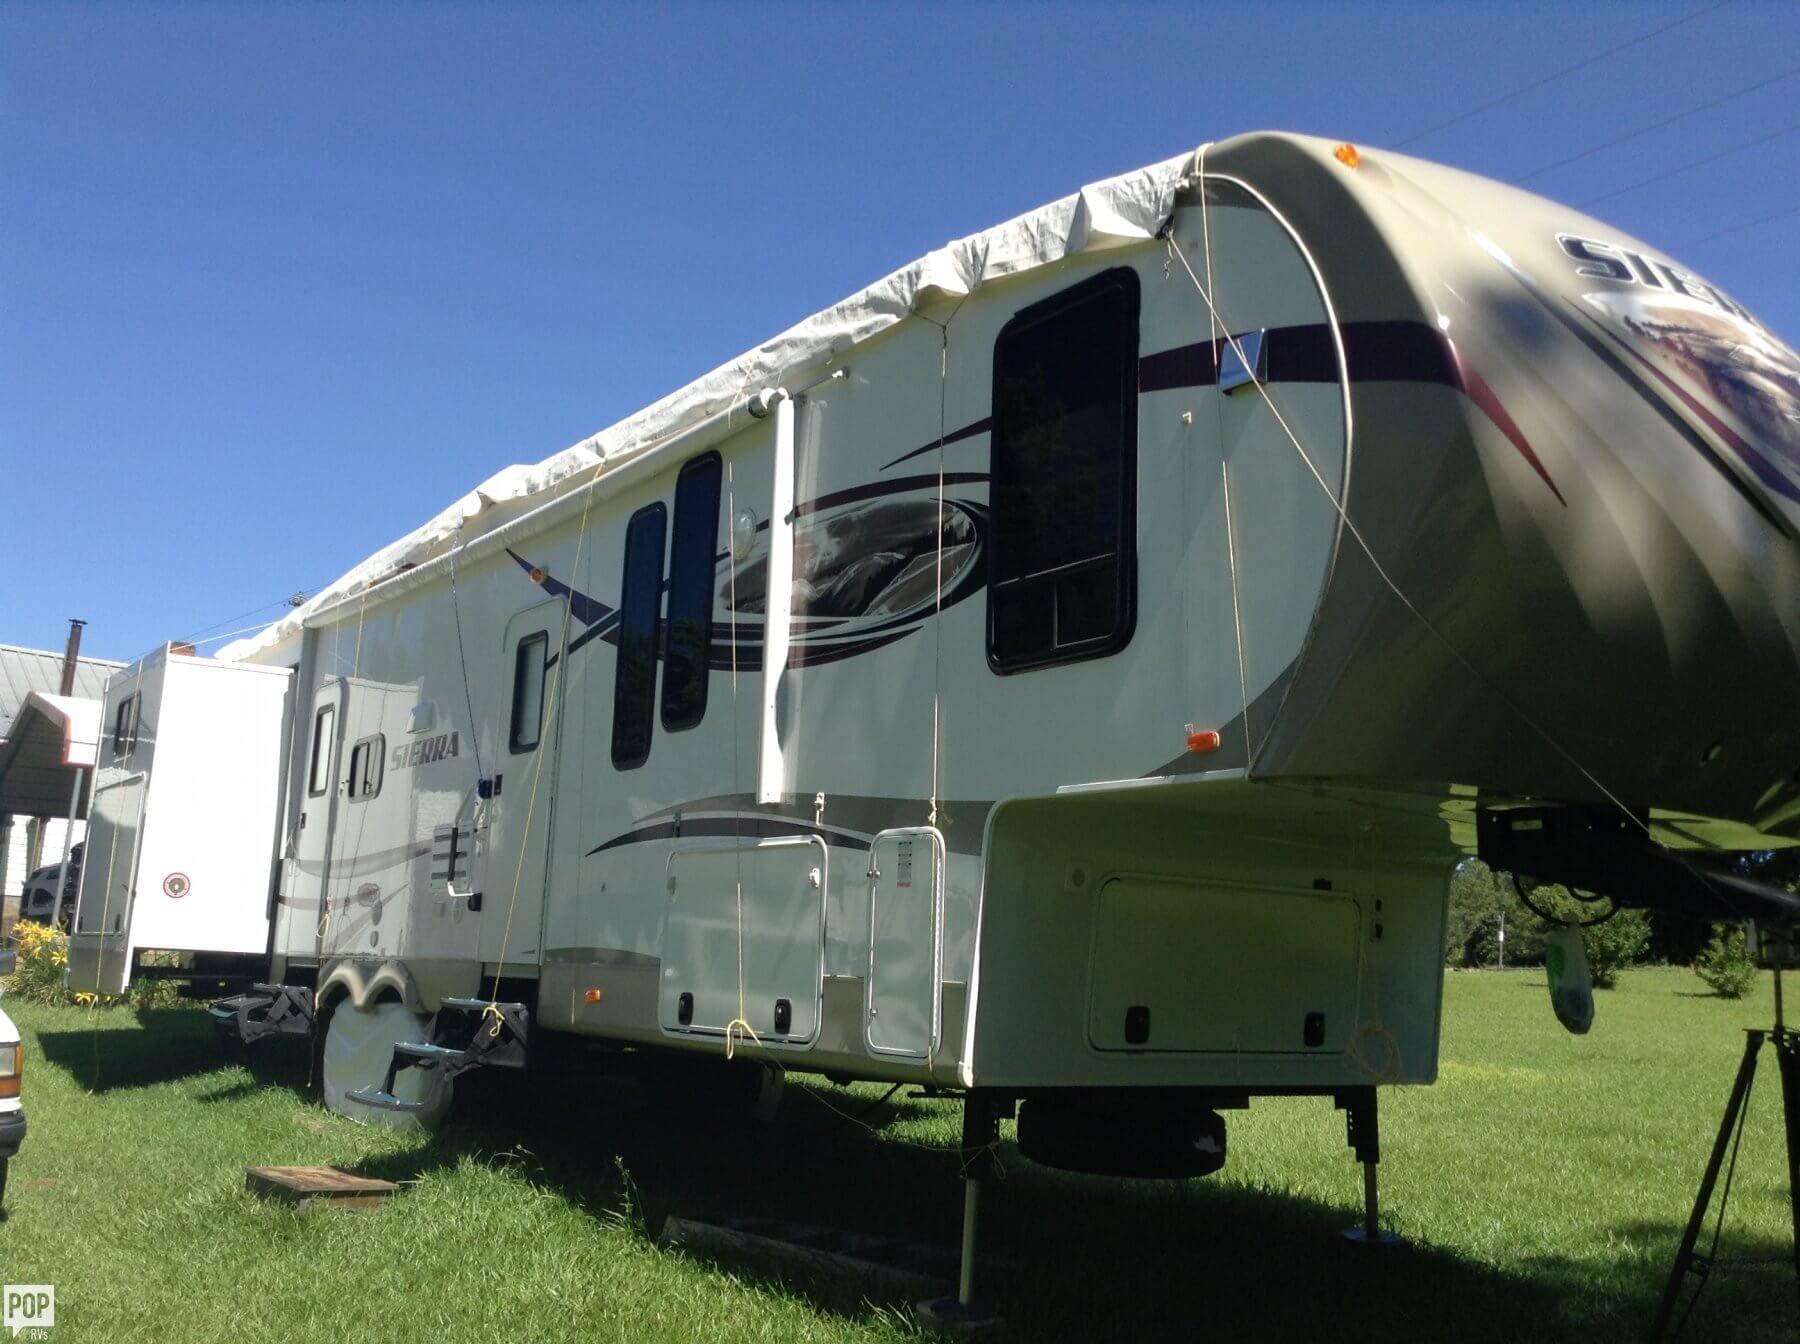 2014 Sierra 365saqb For Sale Forest River Camper Trailer For Sale Campers For Sale